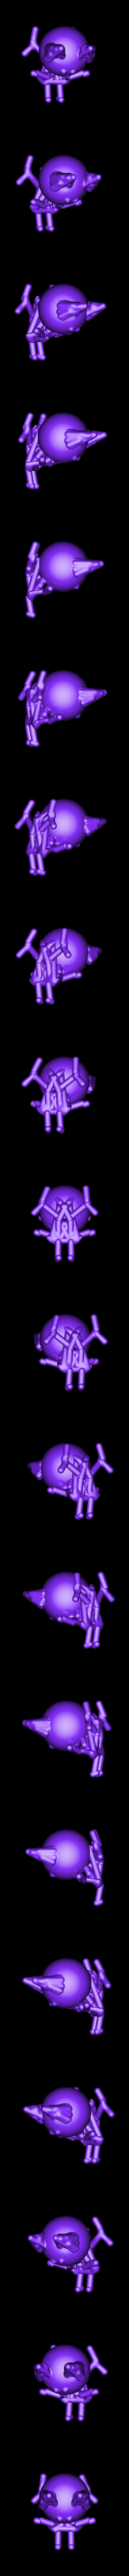 daphne_cat_ready.stl Download free STL file Toy Flying  Cat • Design to 3D print, gafnorin